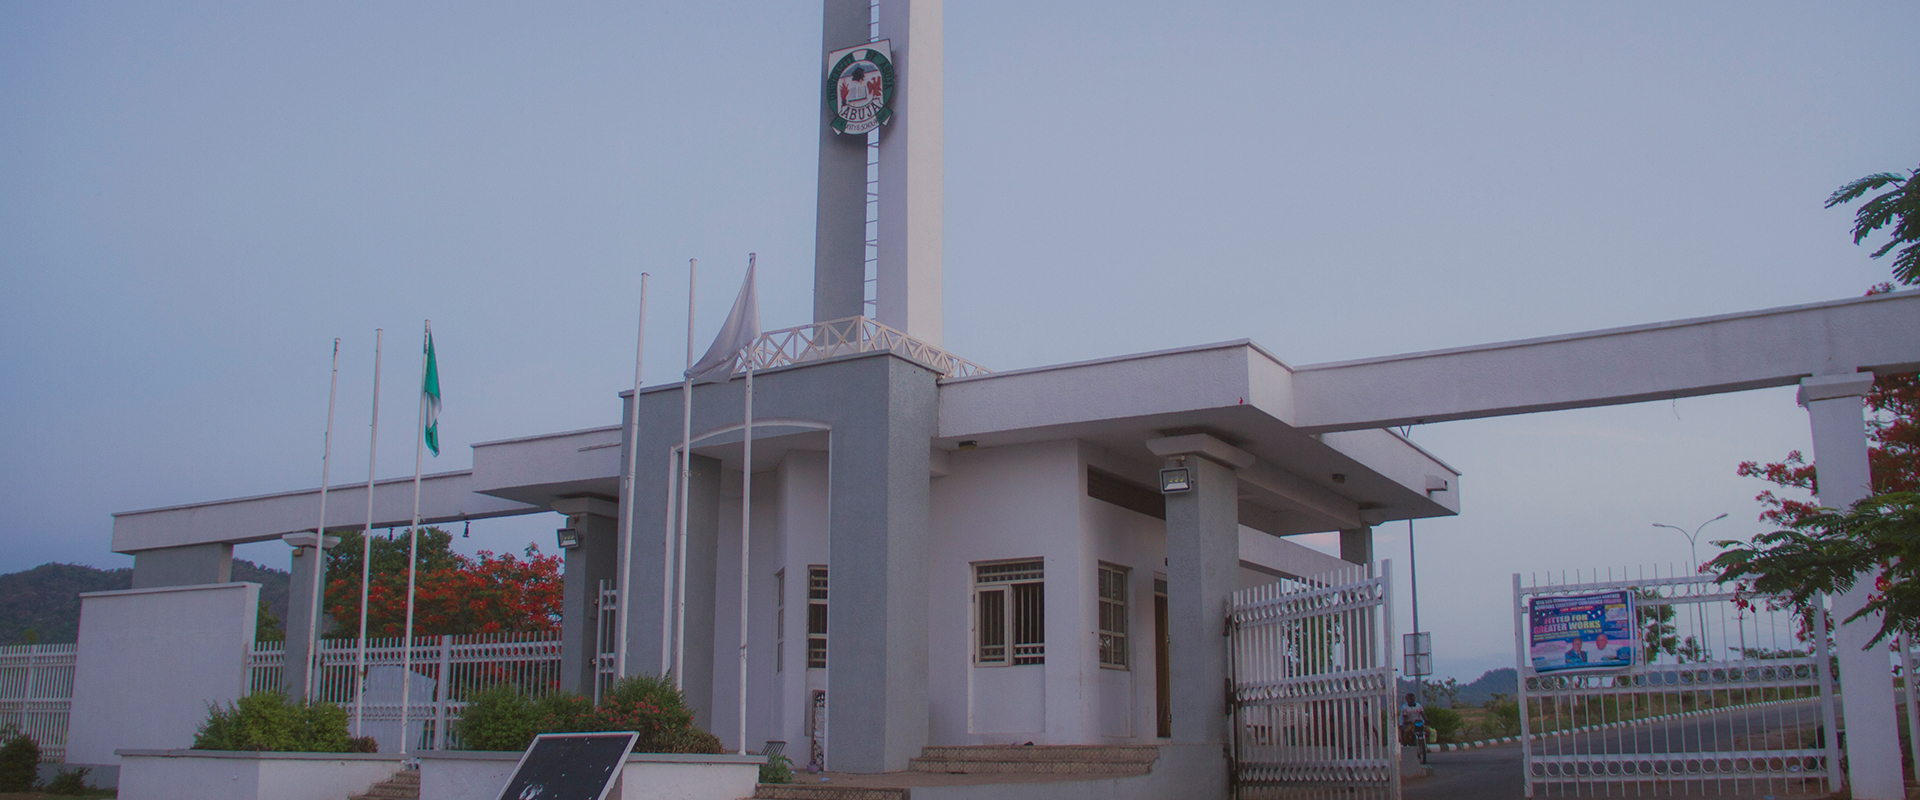 University of Abuja – Uniabuja Campus